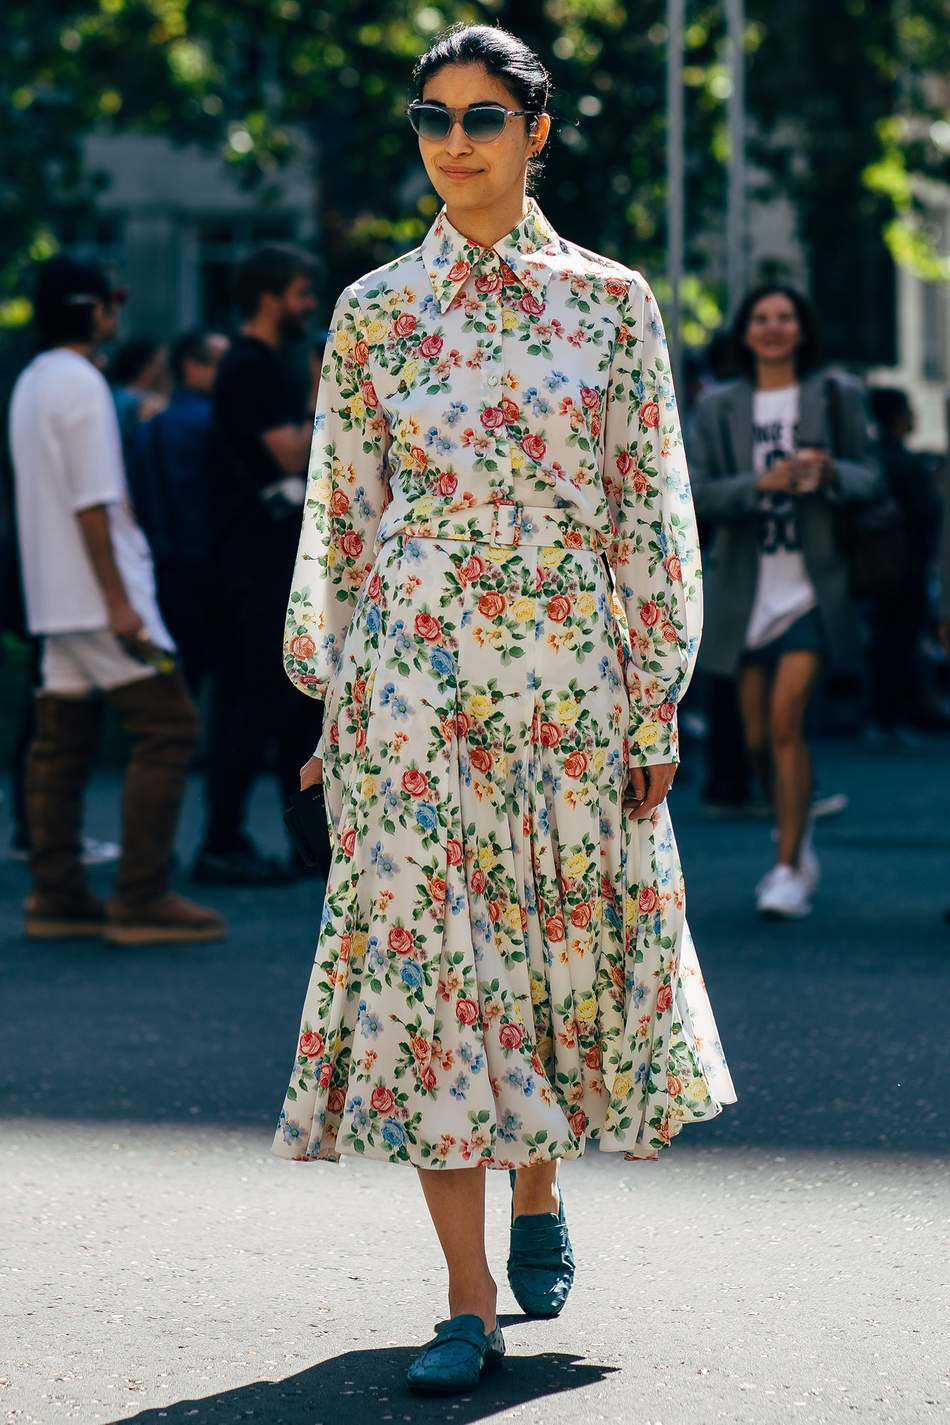 ModeSens 人人都爱茶会连衣裙 Fashion Celebrity Trending Style